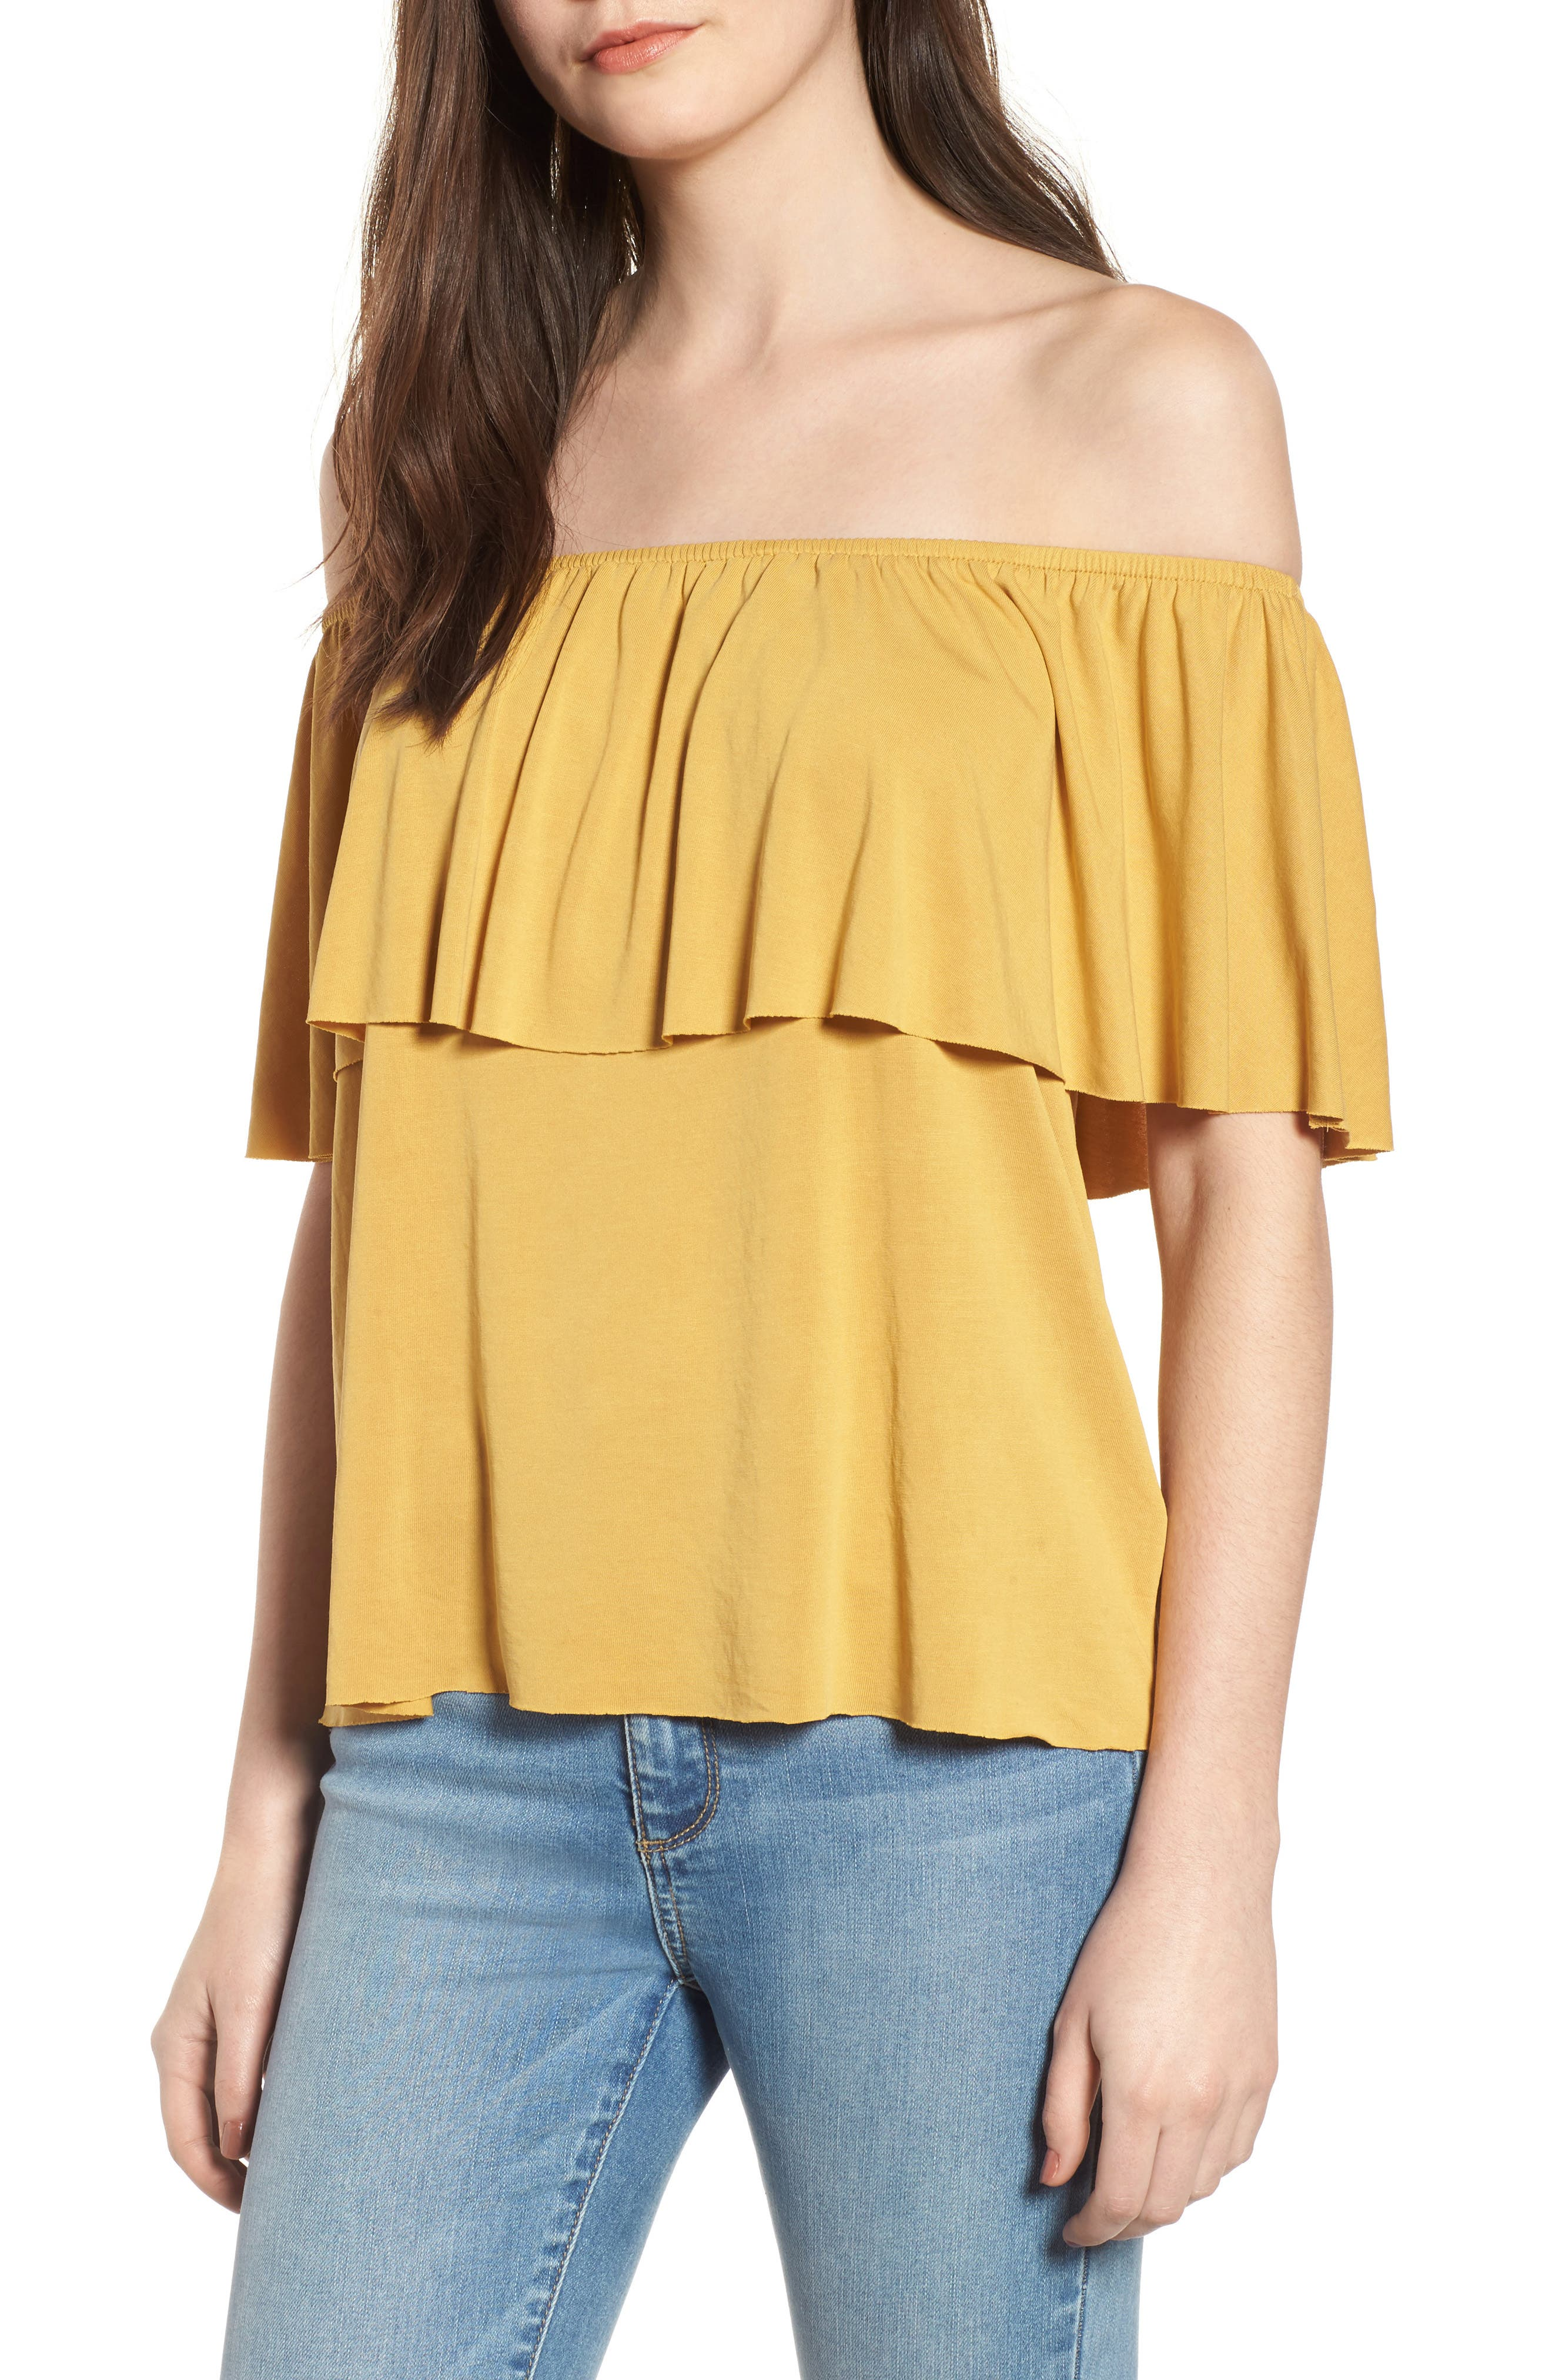 Lira Clothing Naomi Off the Shoulder Top